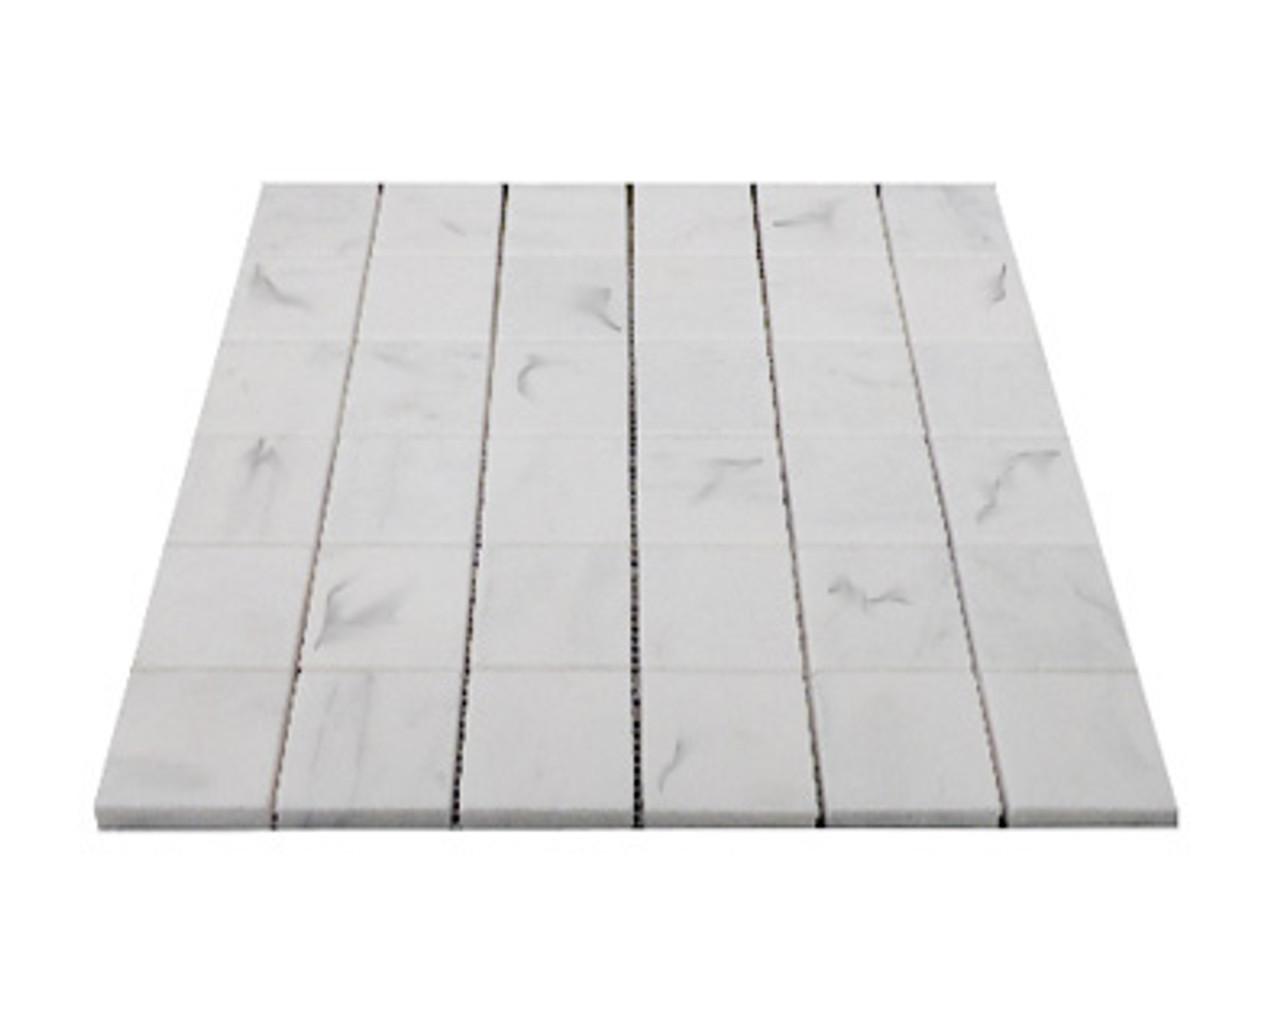 carrara marble italian white bianco carrera 2x2 mosaic tile honed